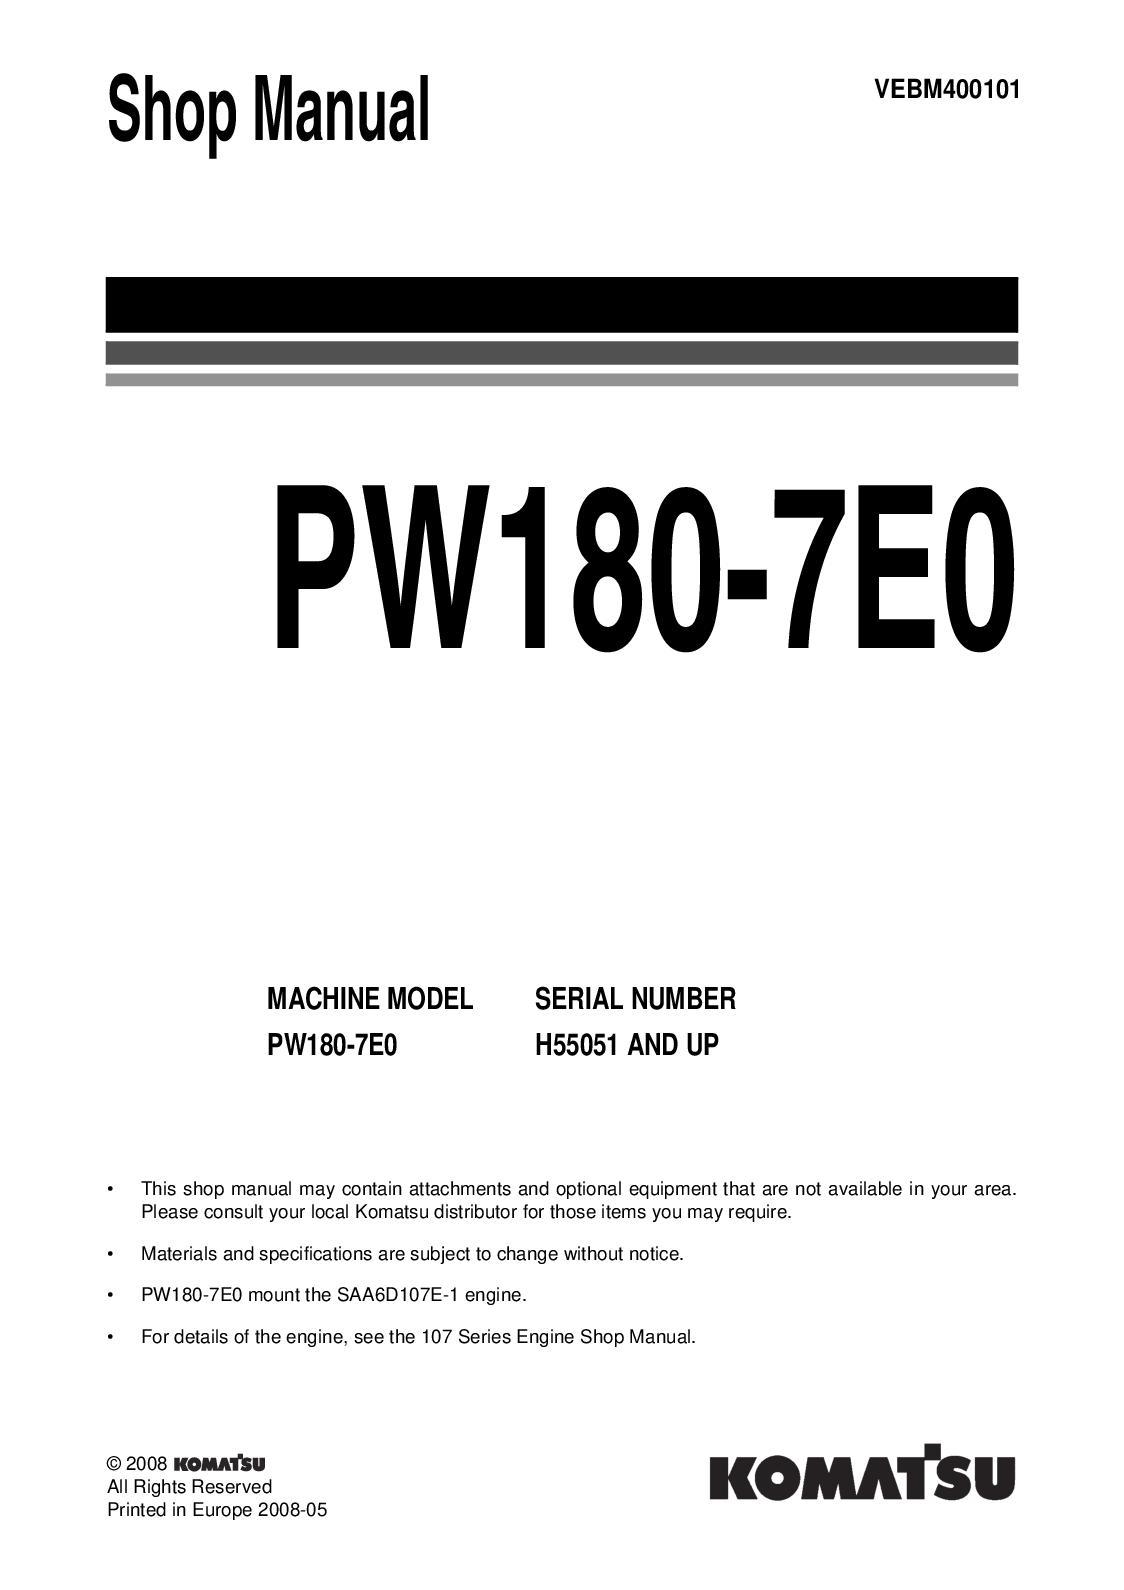 Calamo Sm Eng Pw180 7e0 Vebm400101 1 394 Pb4 Booster Pump Motor Wiring Diagram